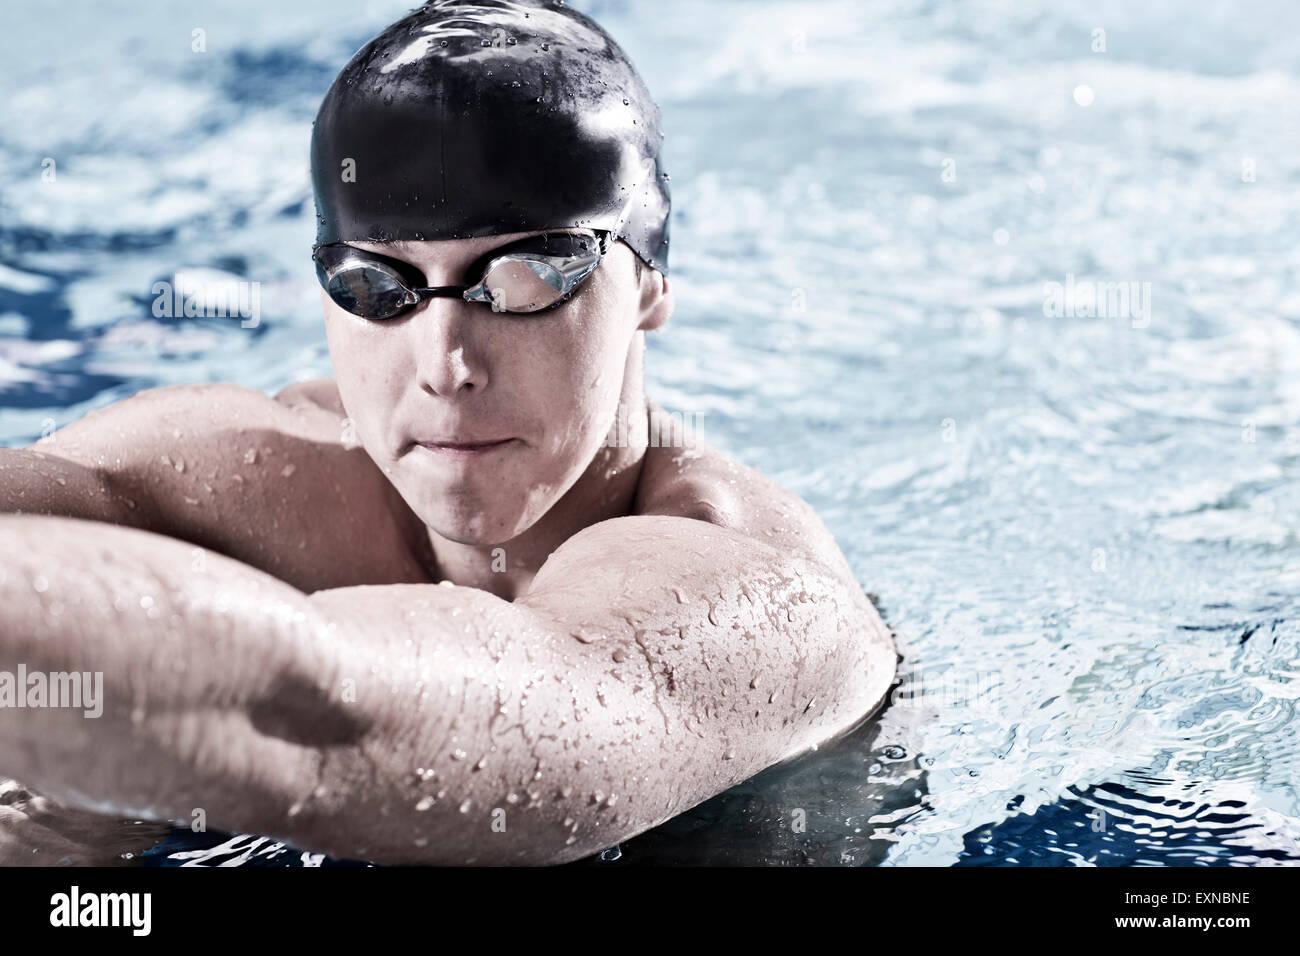 Swimmer in indoor pool - Stock Image